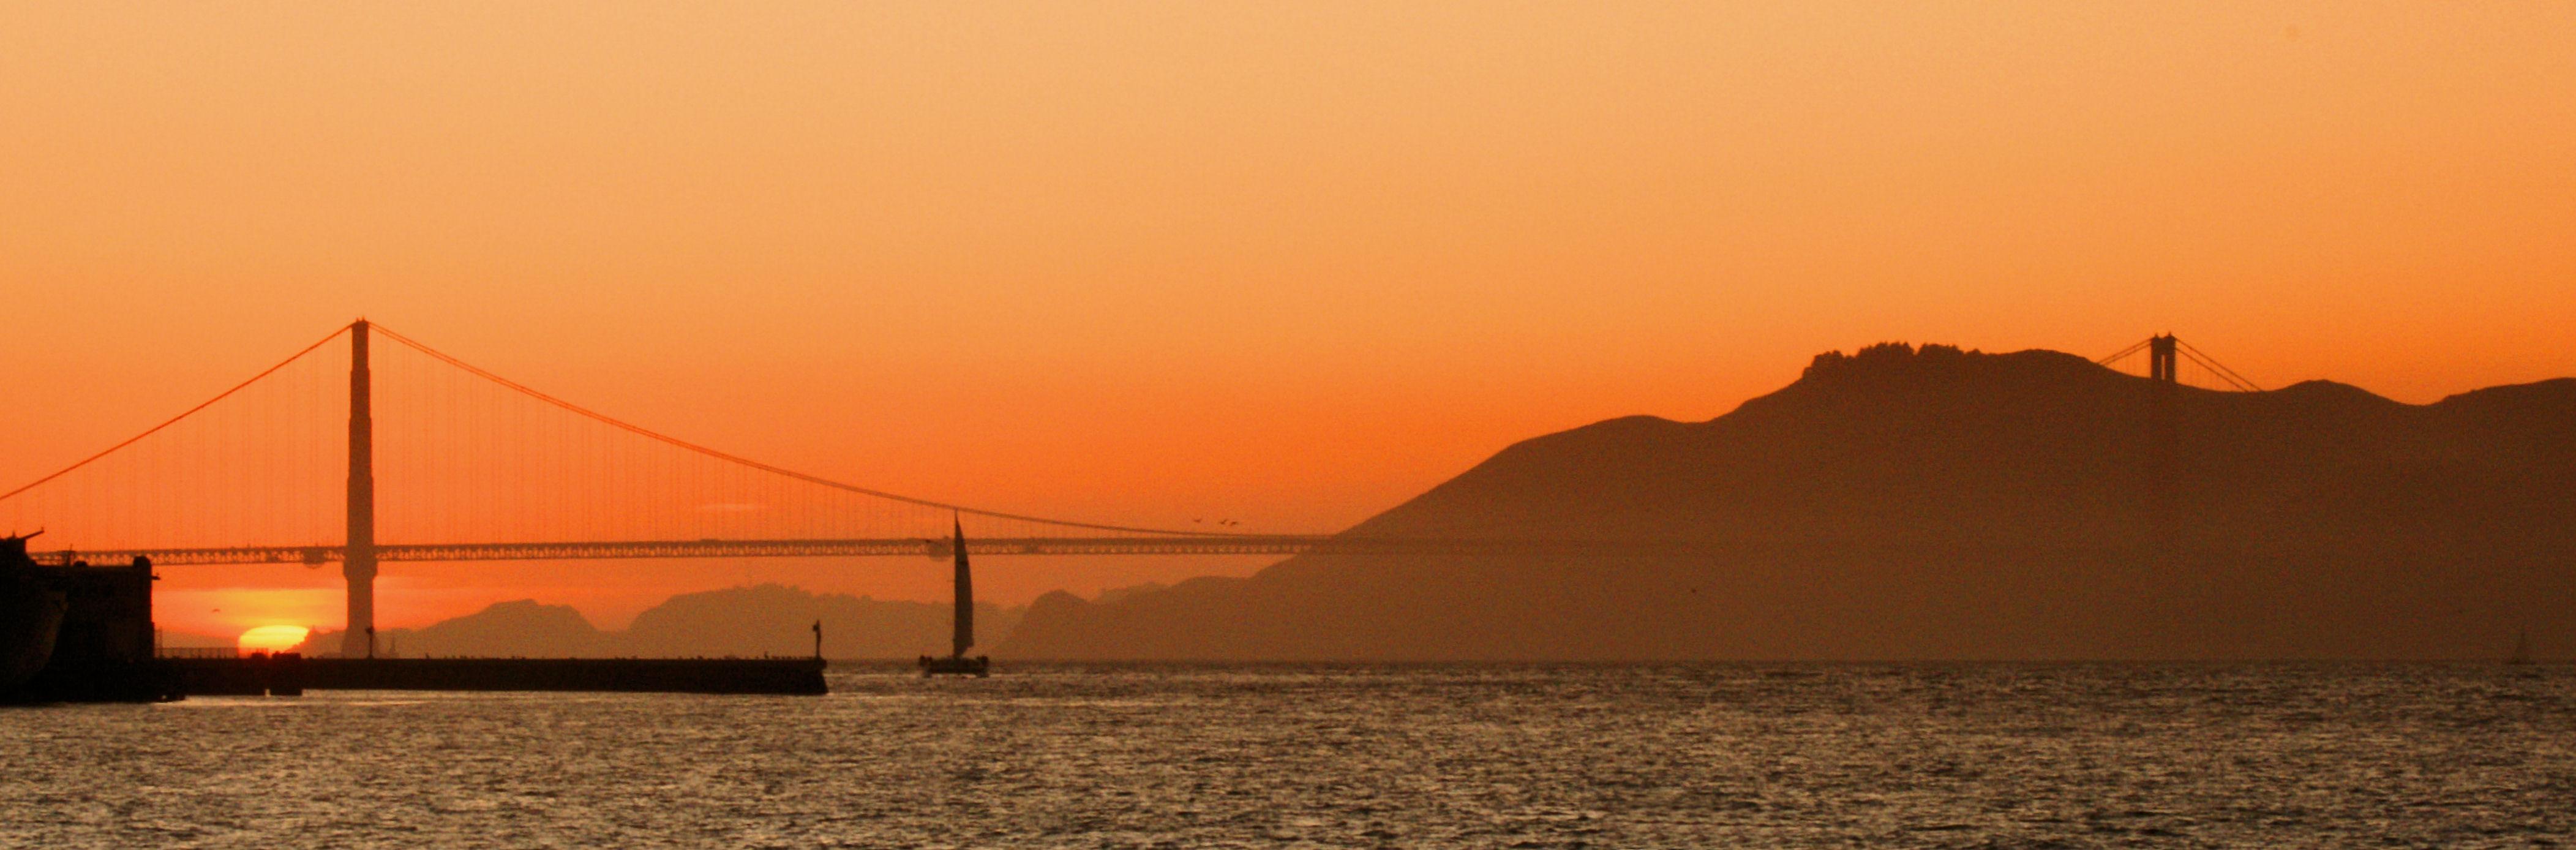 09_18_09 san francisco sunset